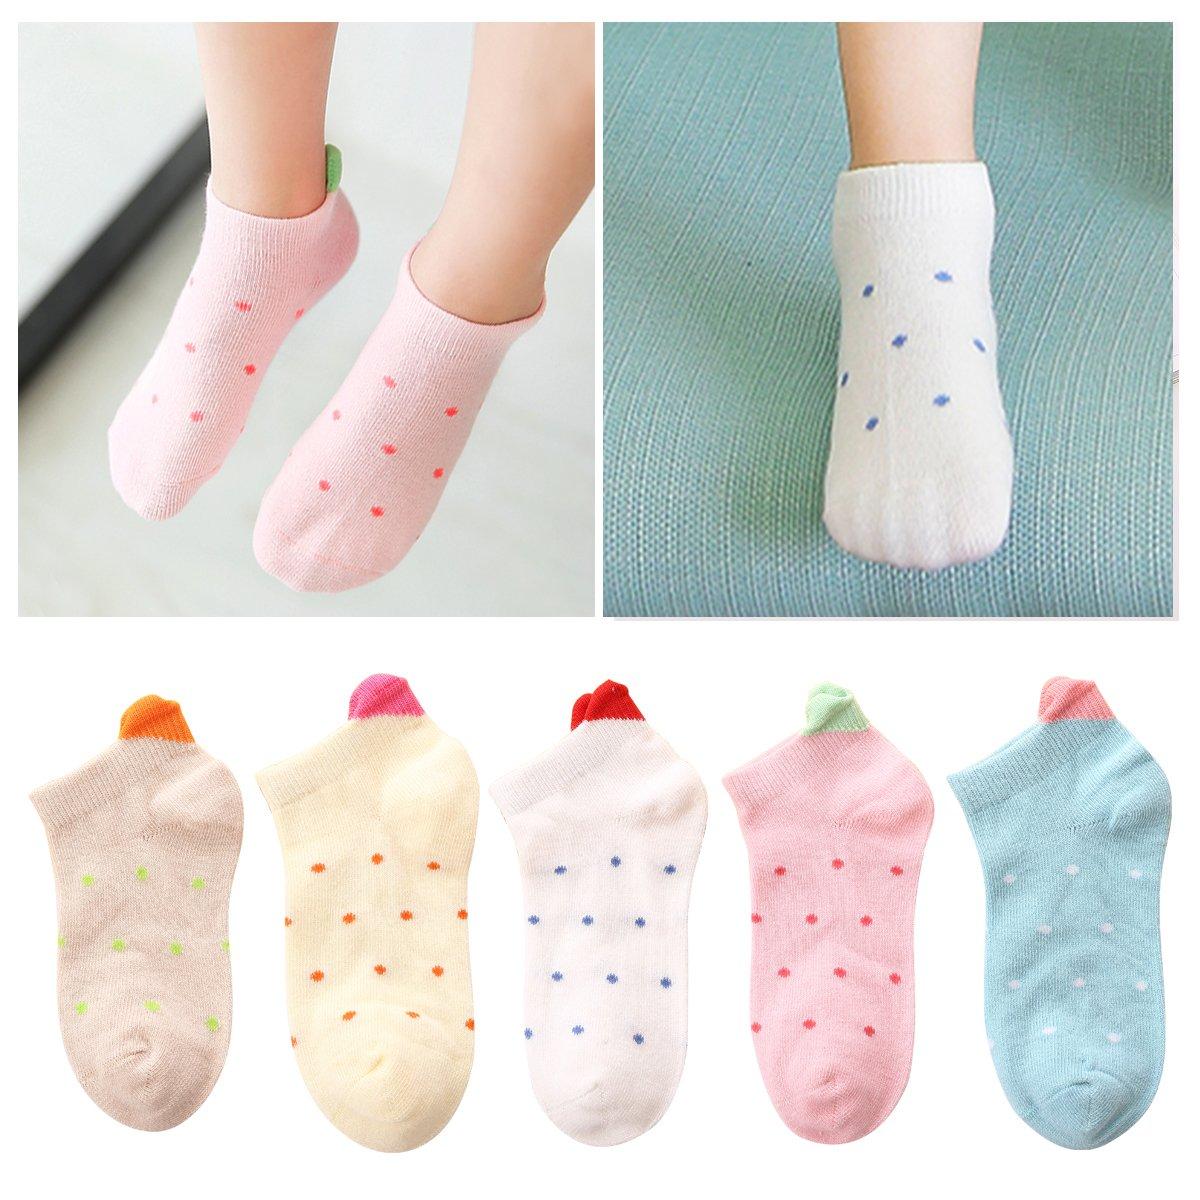 Kidstree Fashion Girls Socks Cotton Thin Toddler Crew Sock 5 Pairs Love Small(2-4)